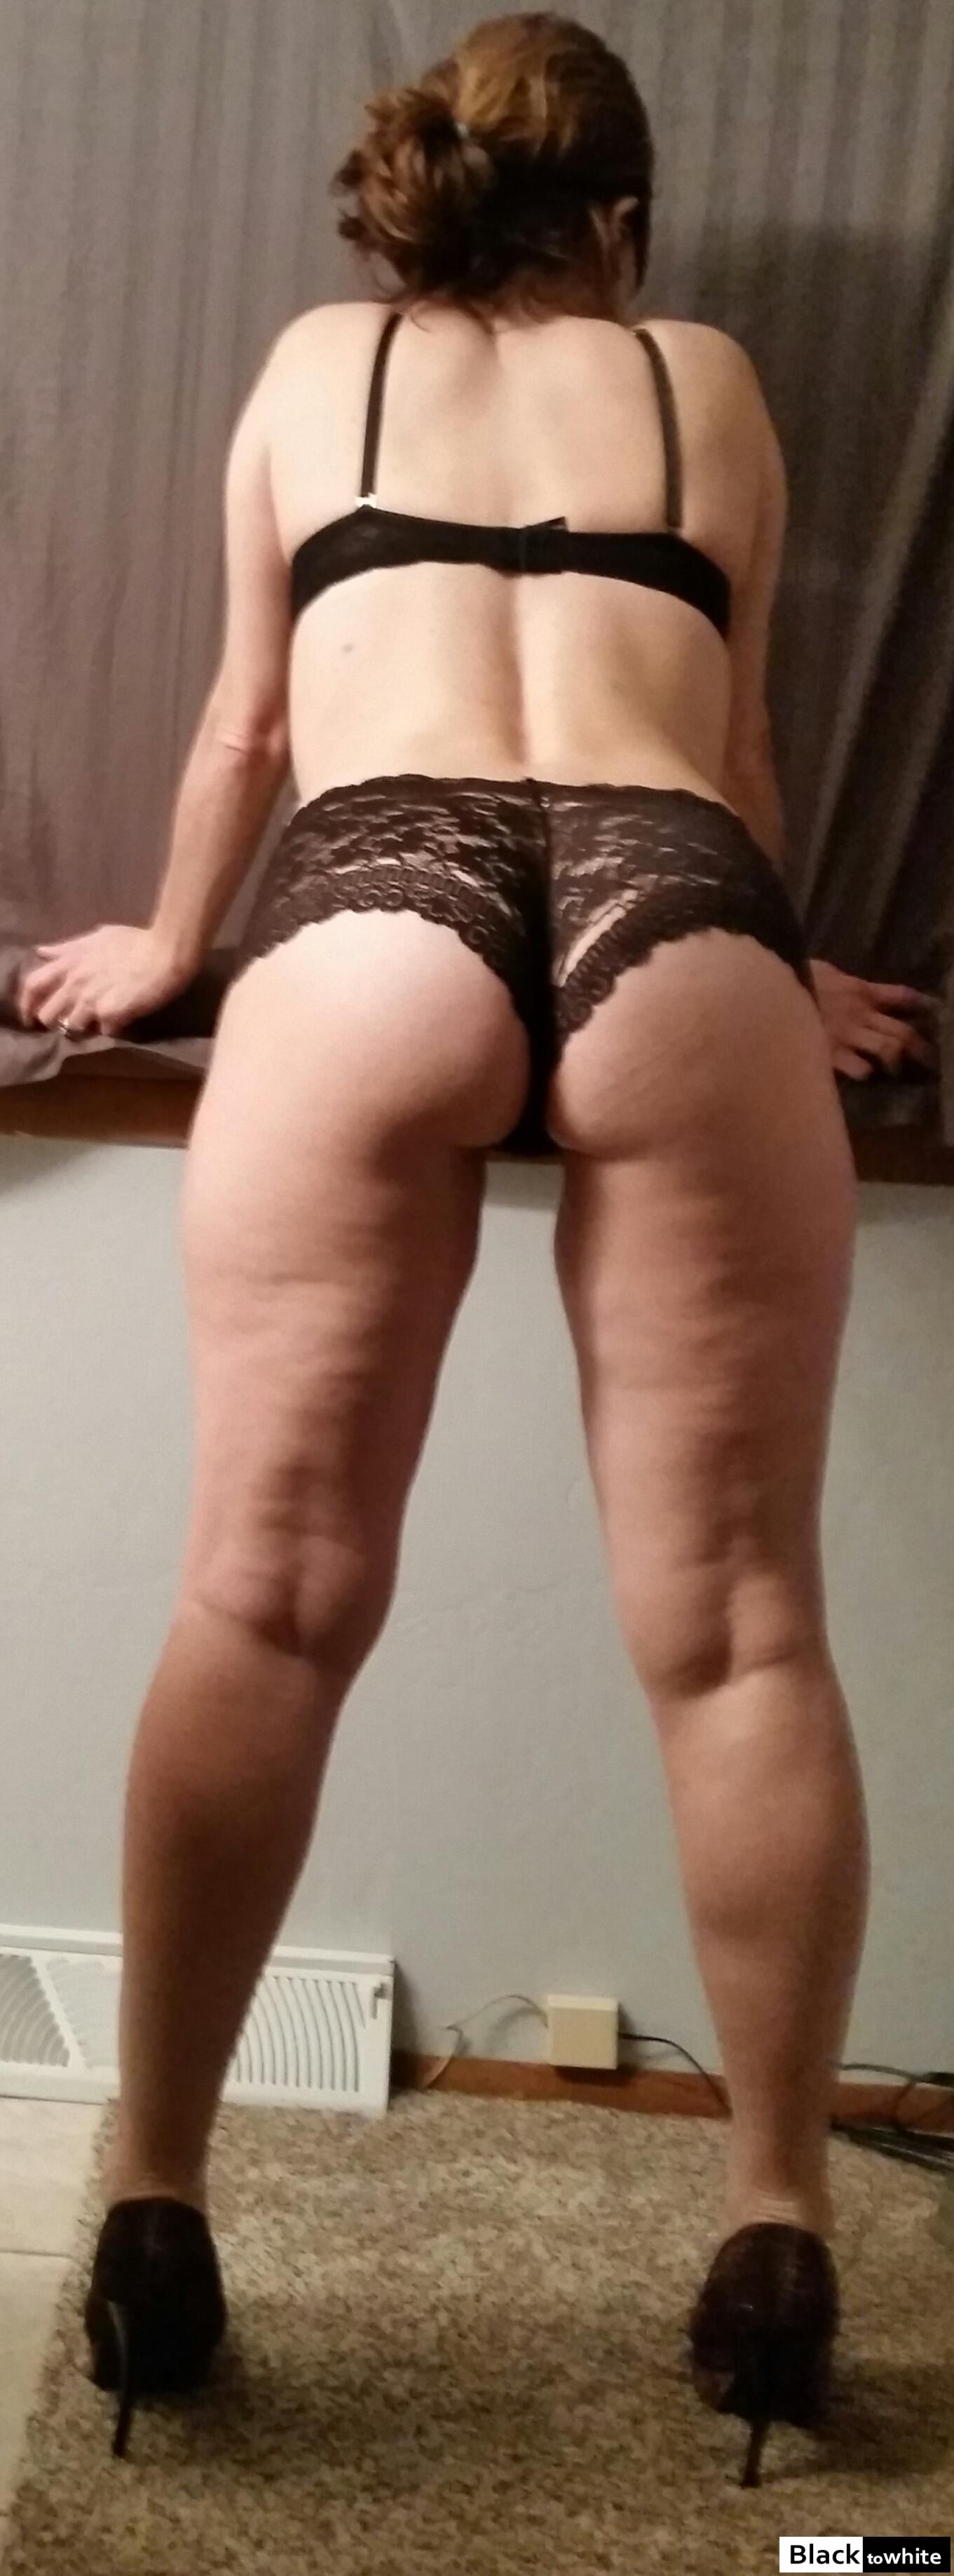 big booty contest!! | page 20 | amateur interracial community